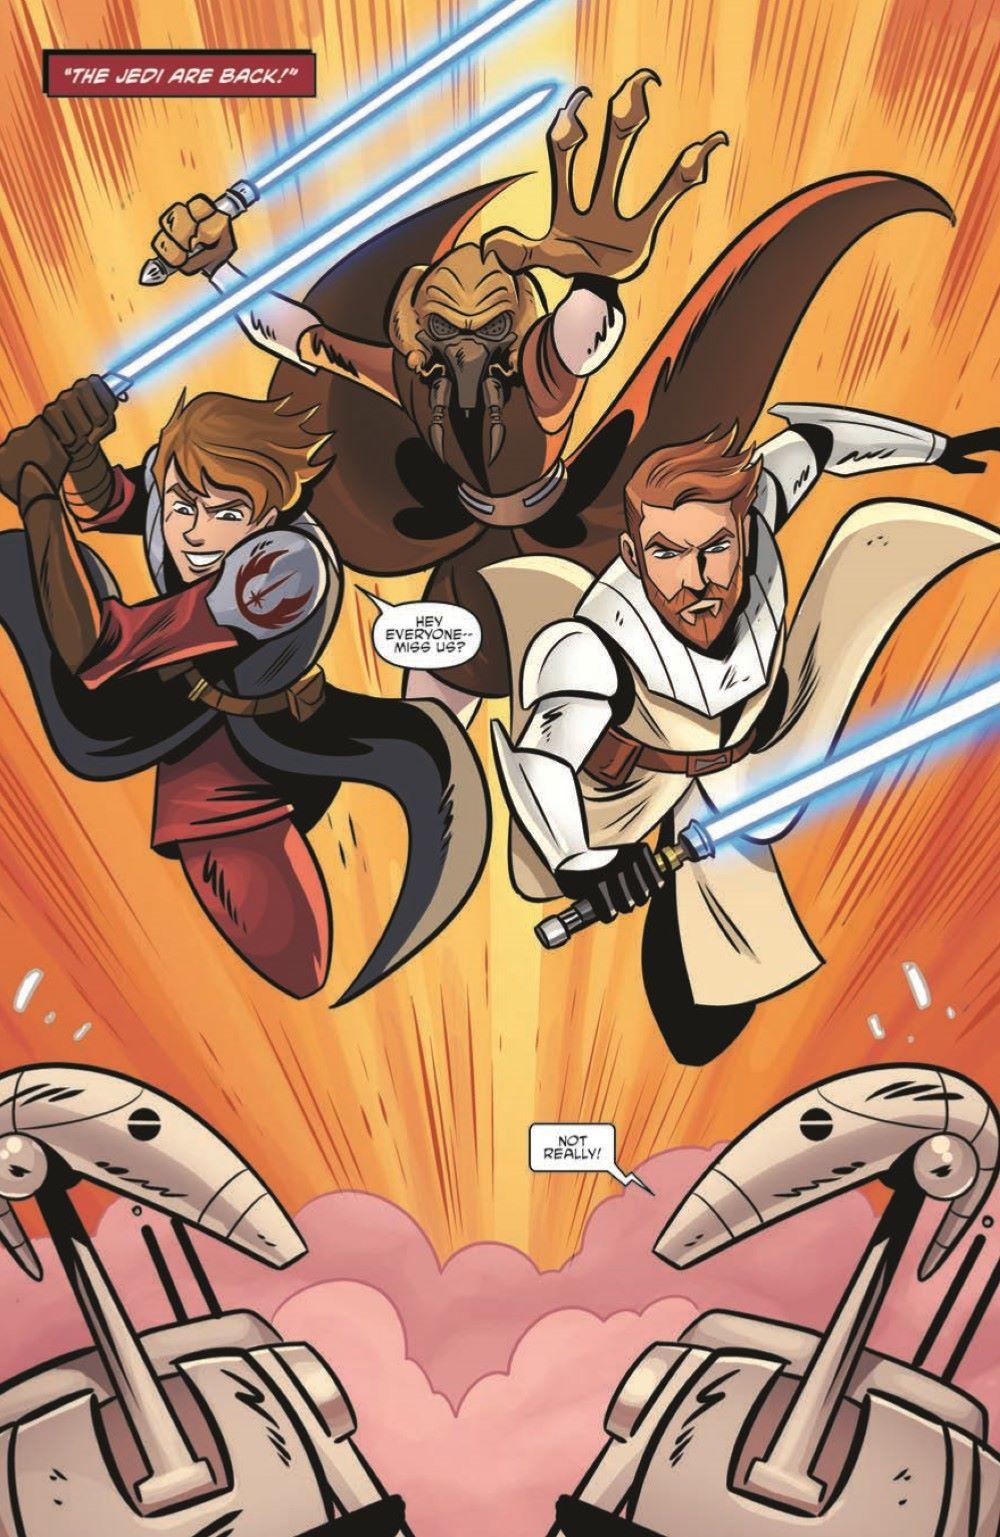 SWA_The-Clone-Wars_Battle-Tales_pr-6 ComicList Previews: STAR WARS ADVENTURES THE CLONE WARS BATTLE TALES GN